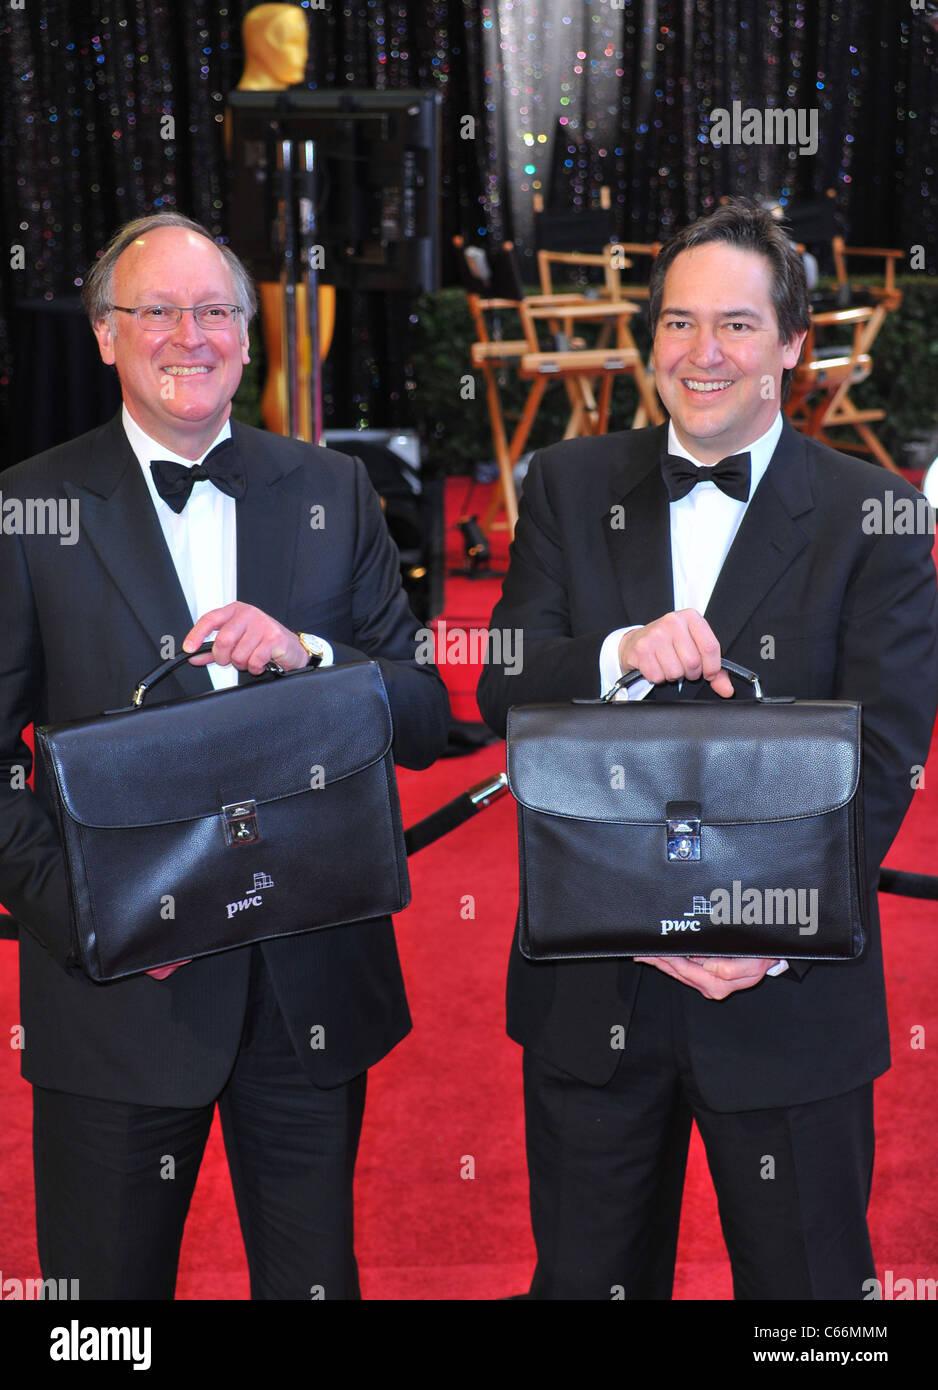 Oscar Award Ballots at arrivals for The 83rd Academy Awards Oscars - Arrivals Part 1, The Kodak Theatre, Los Angeles, - Stock Image